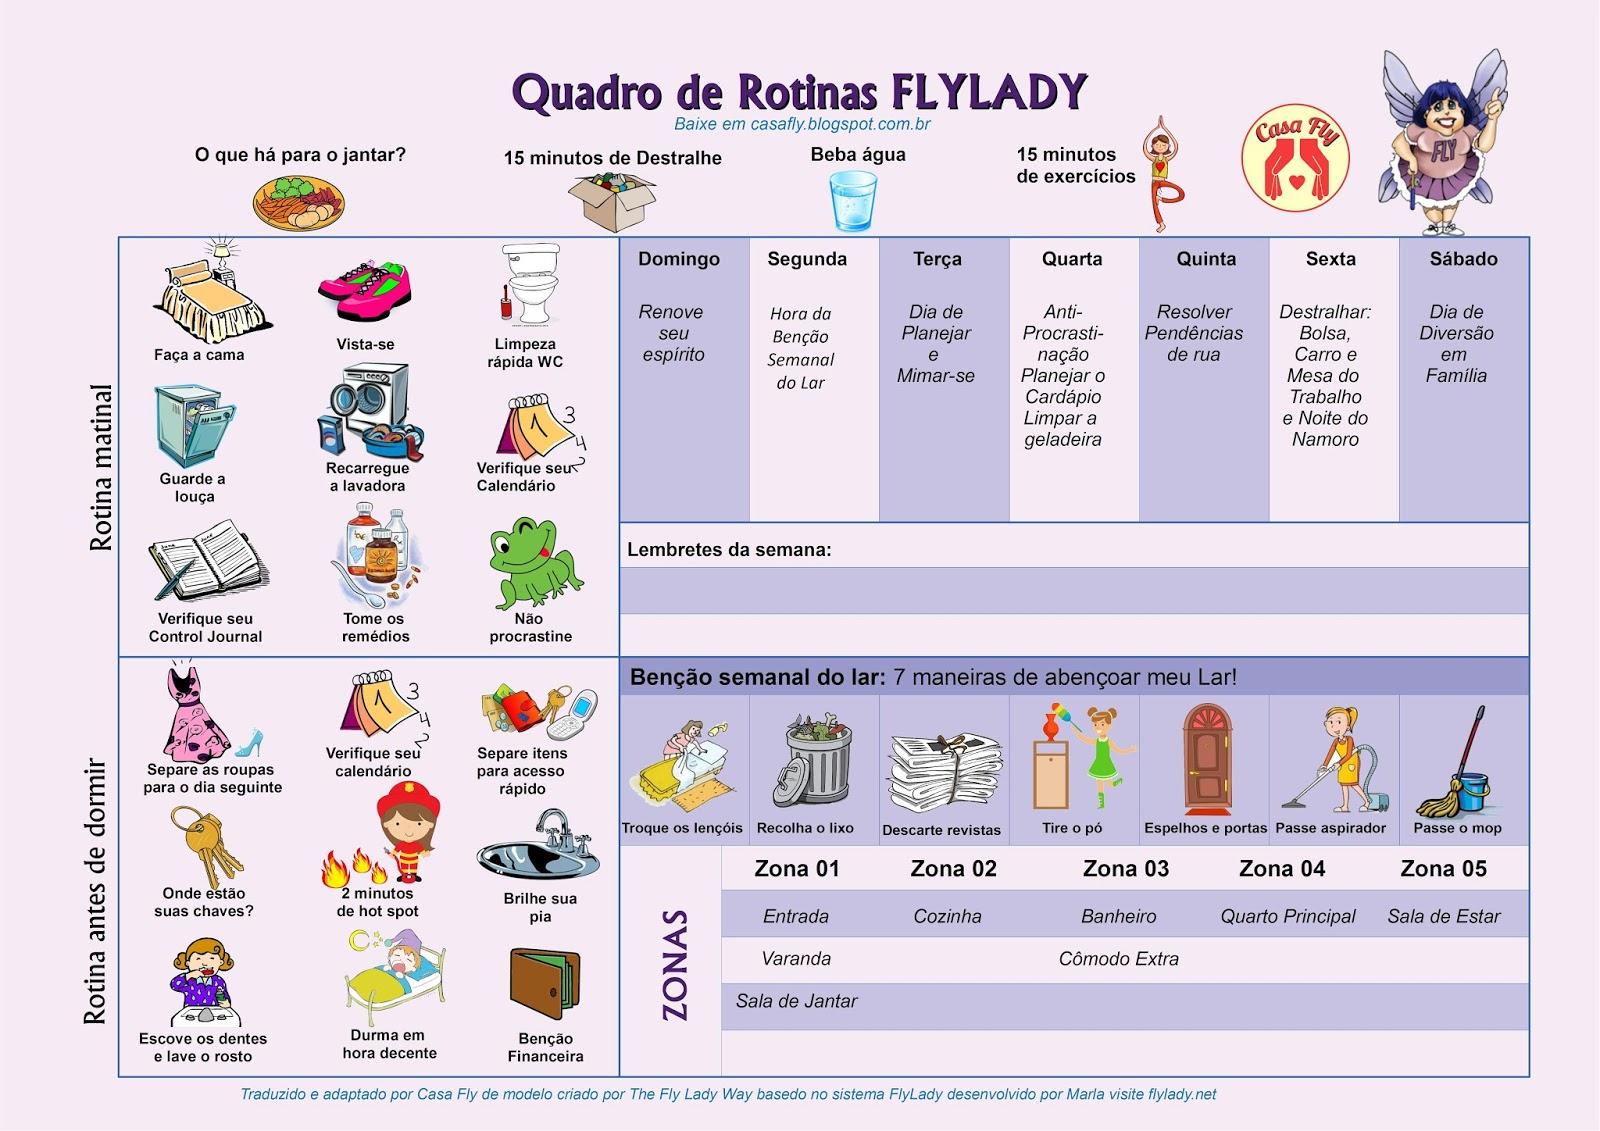 Calendario Flylady.Tabela De Rotinas Flylady Casa Fly